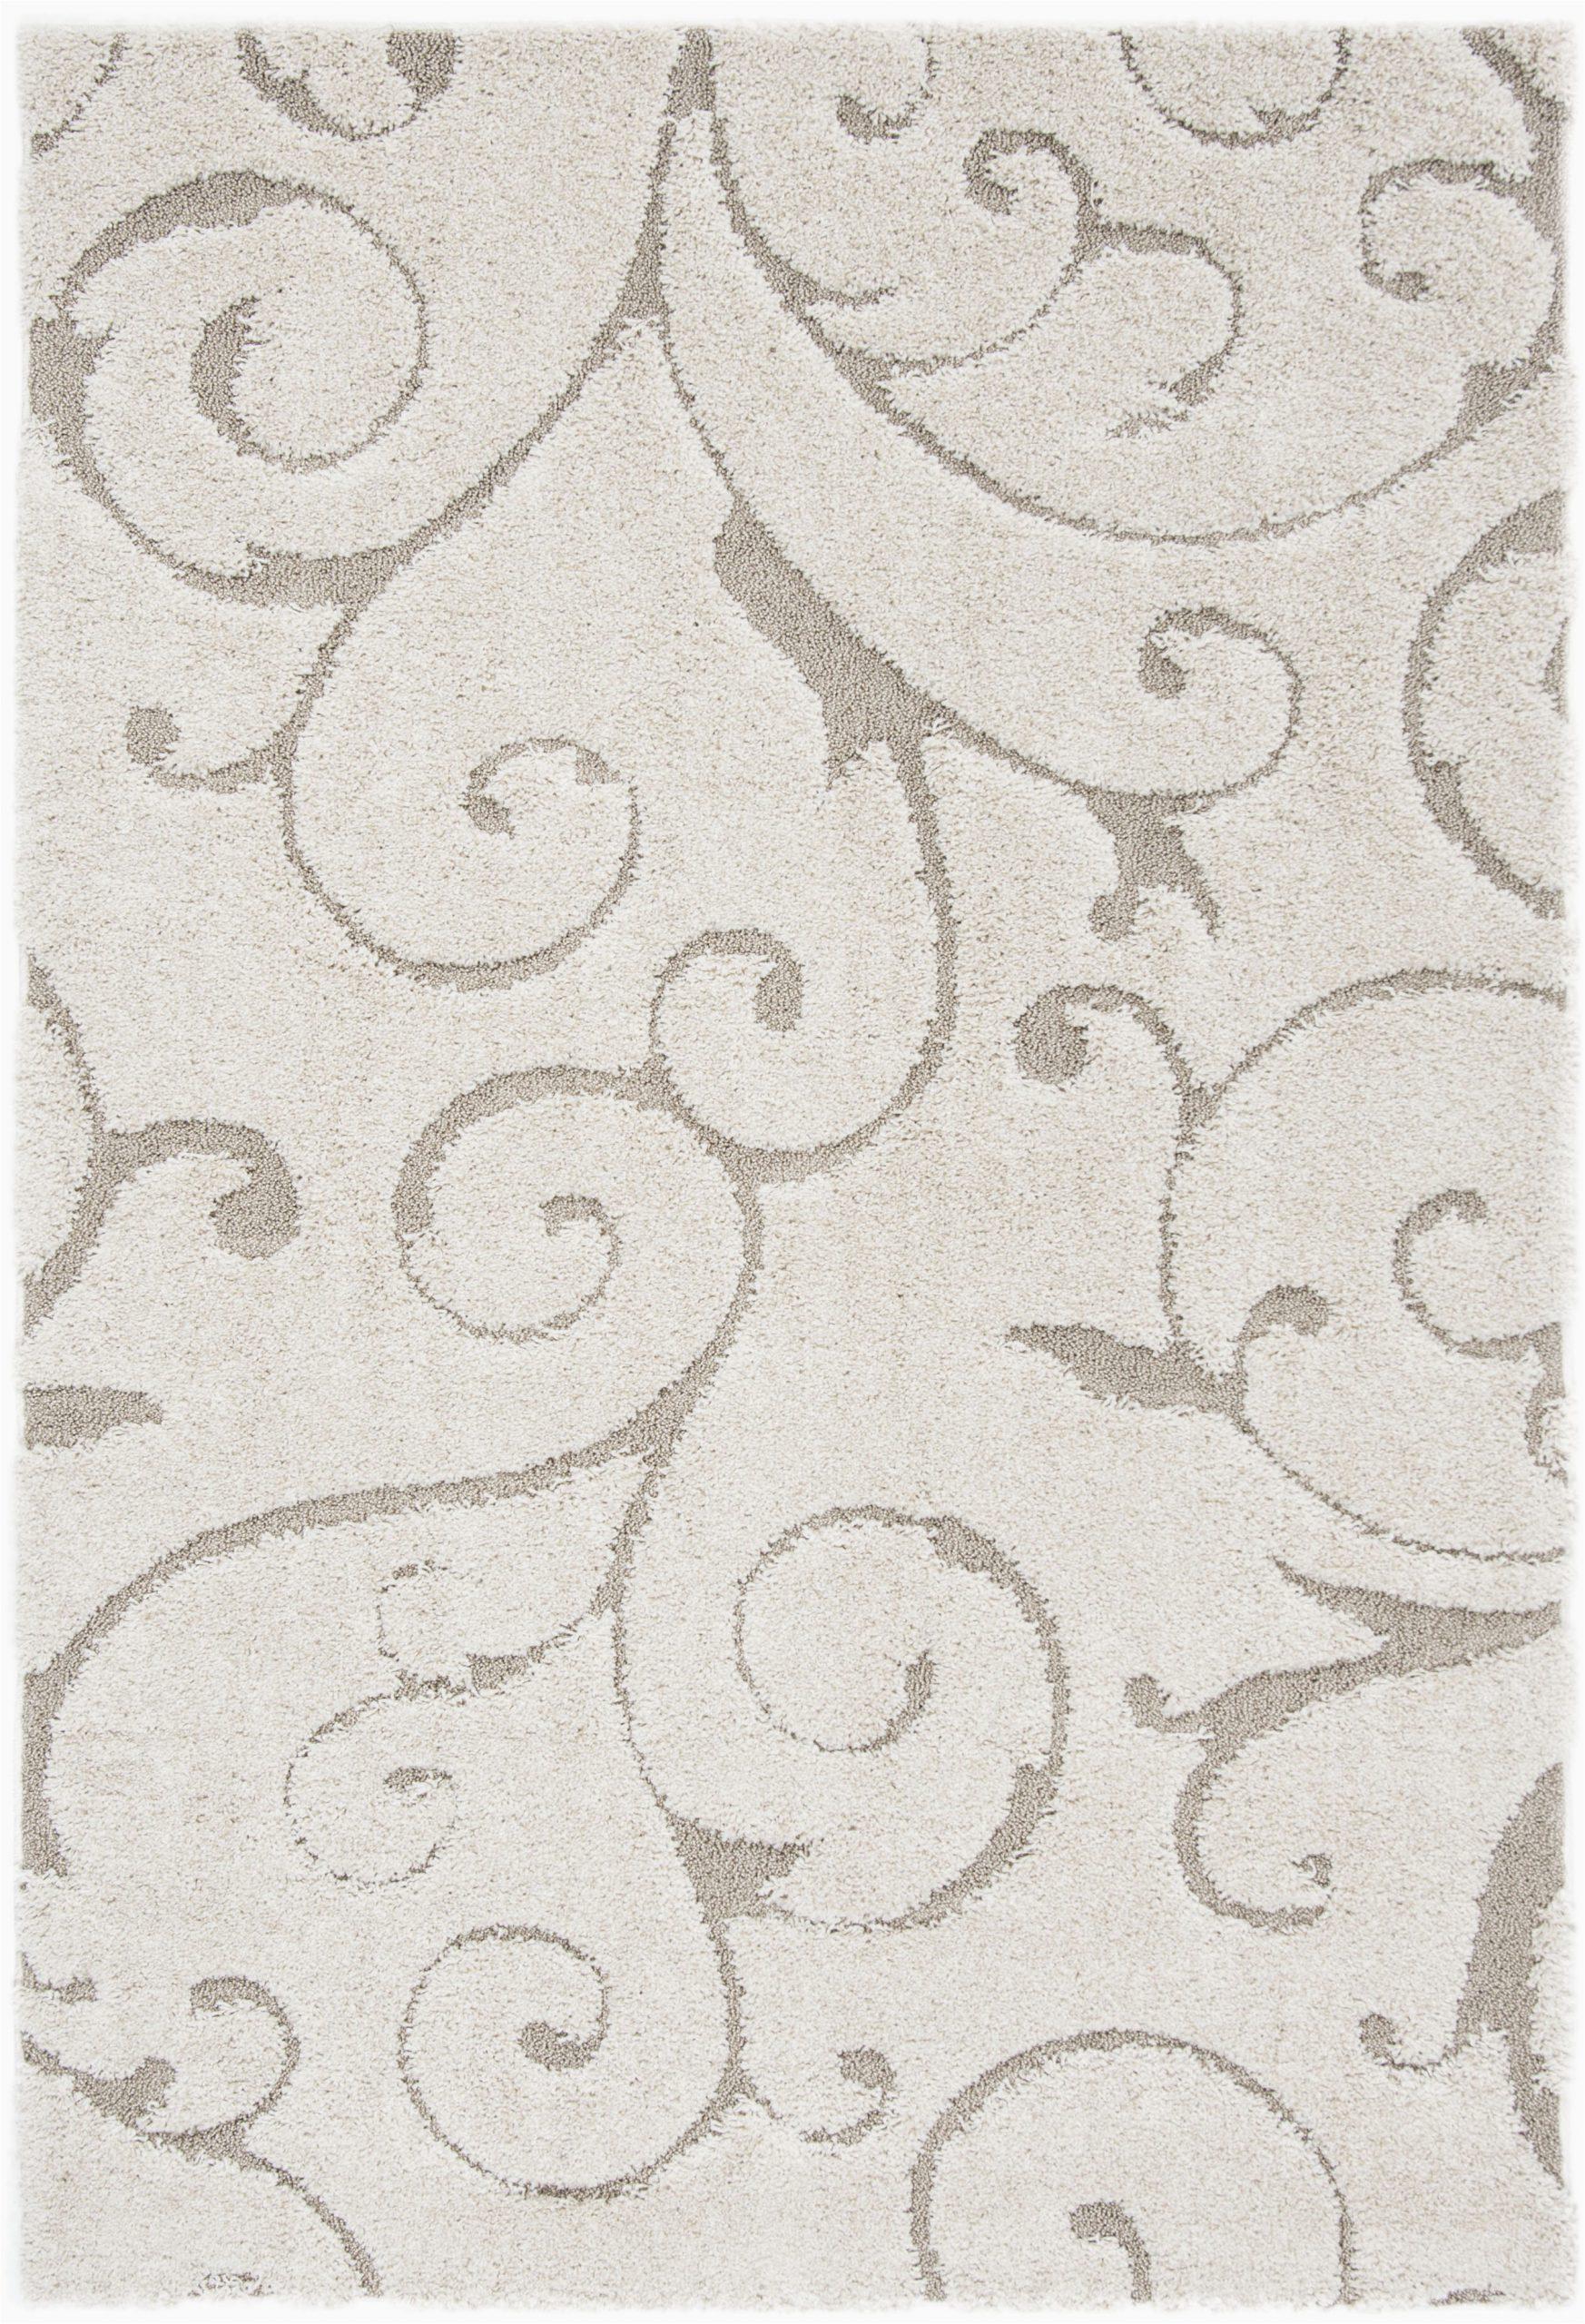 ebern designs benedetti creambeige rug qq7579 piid=